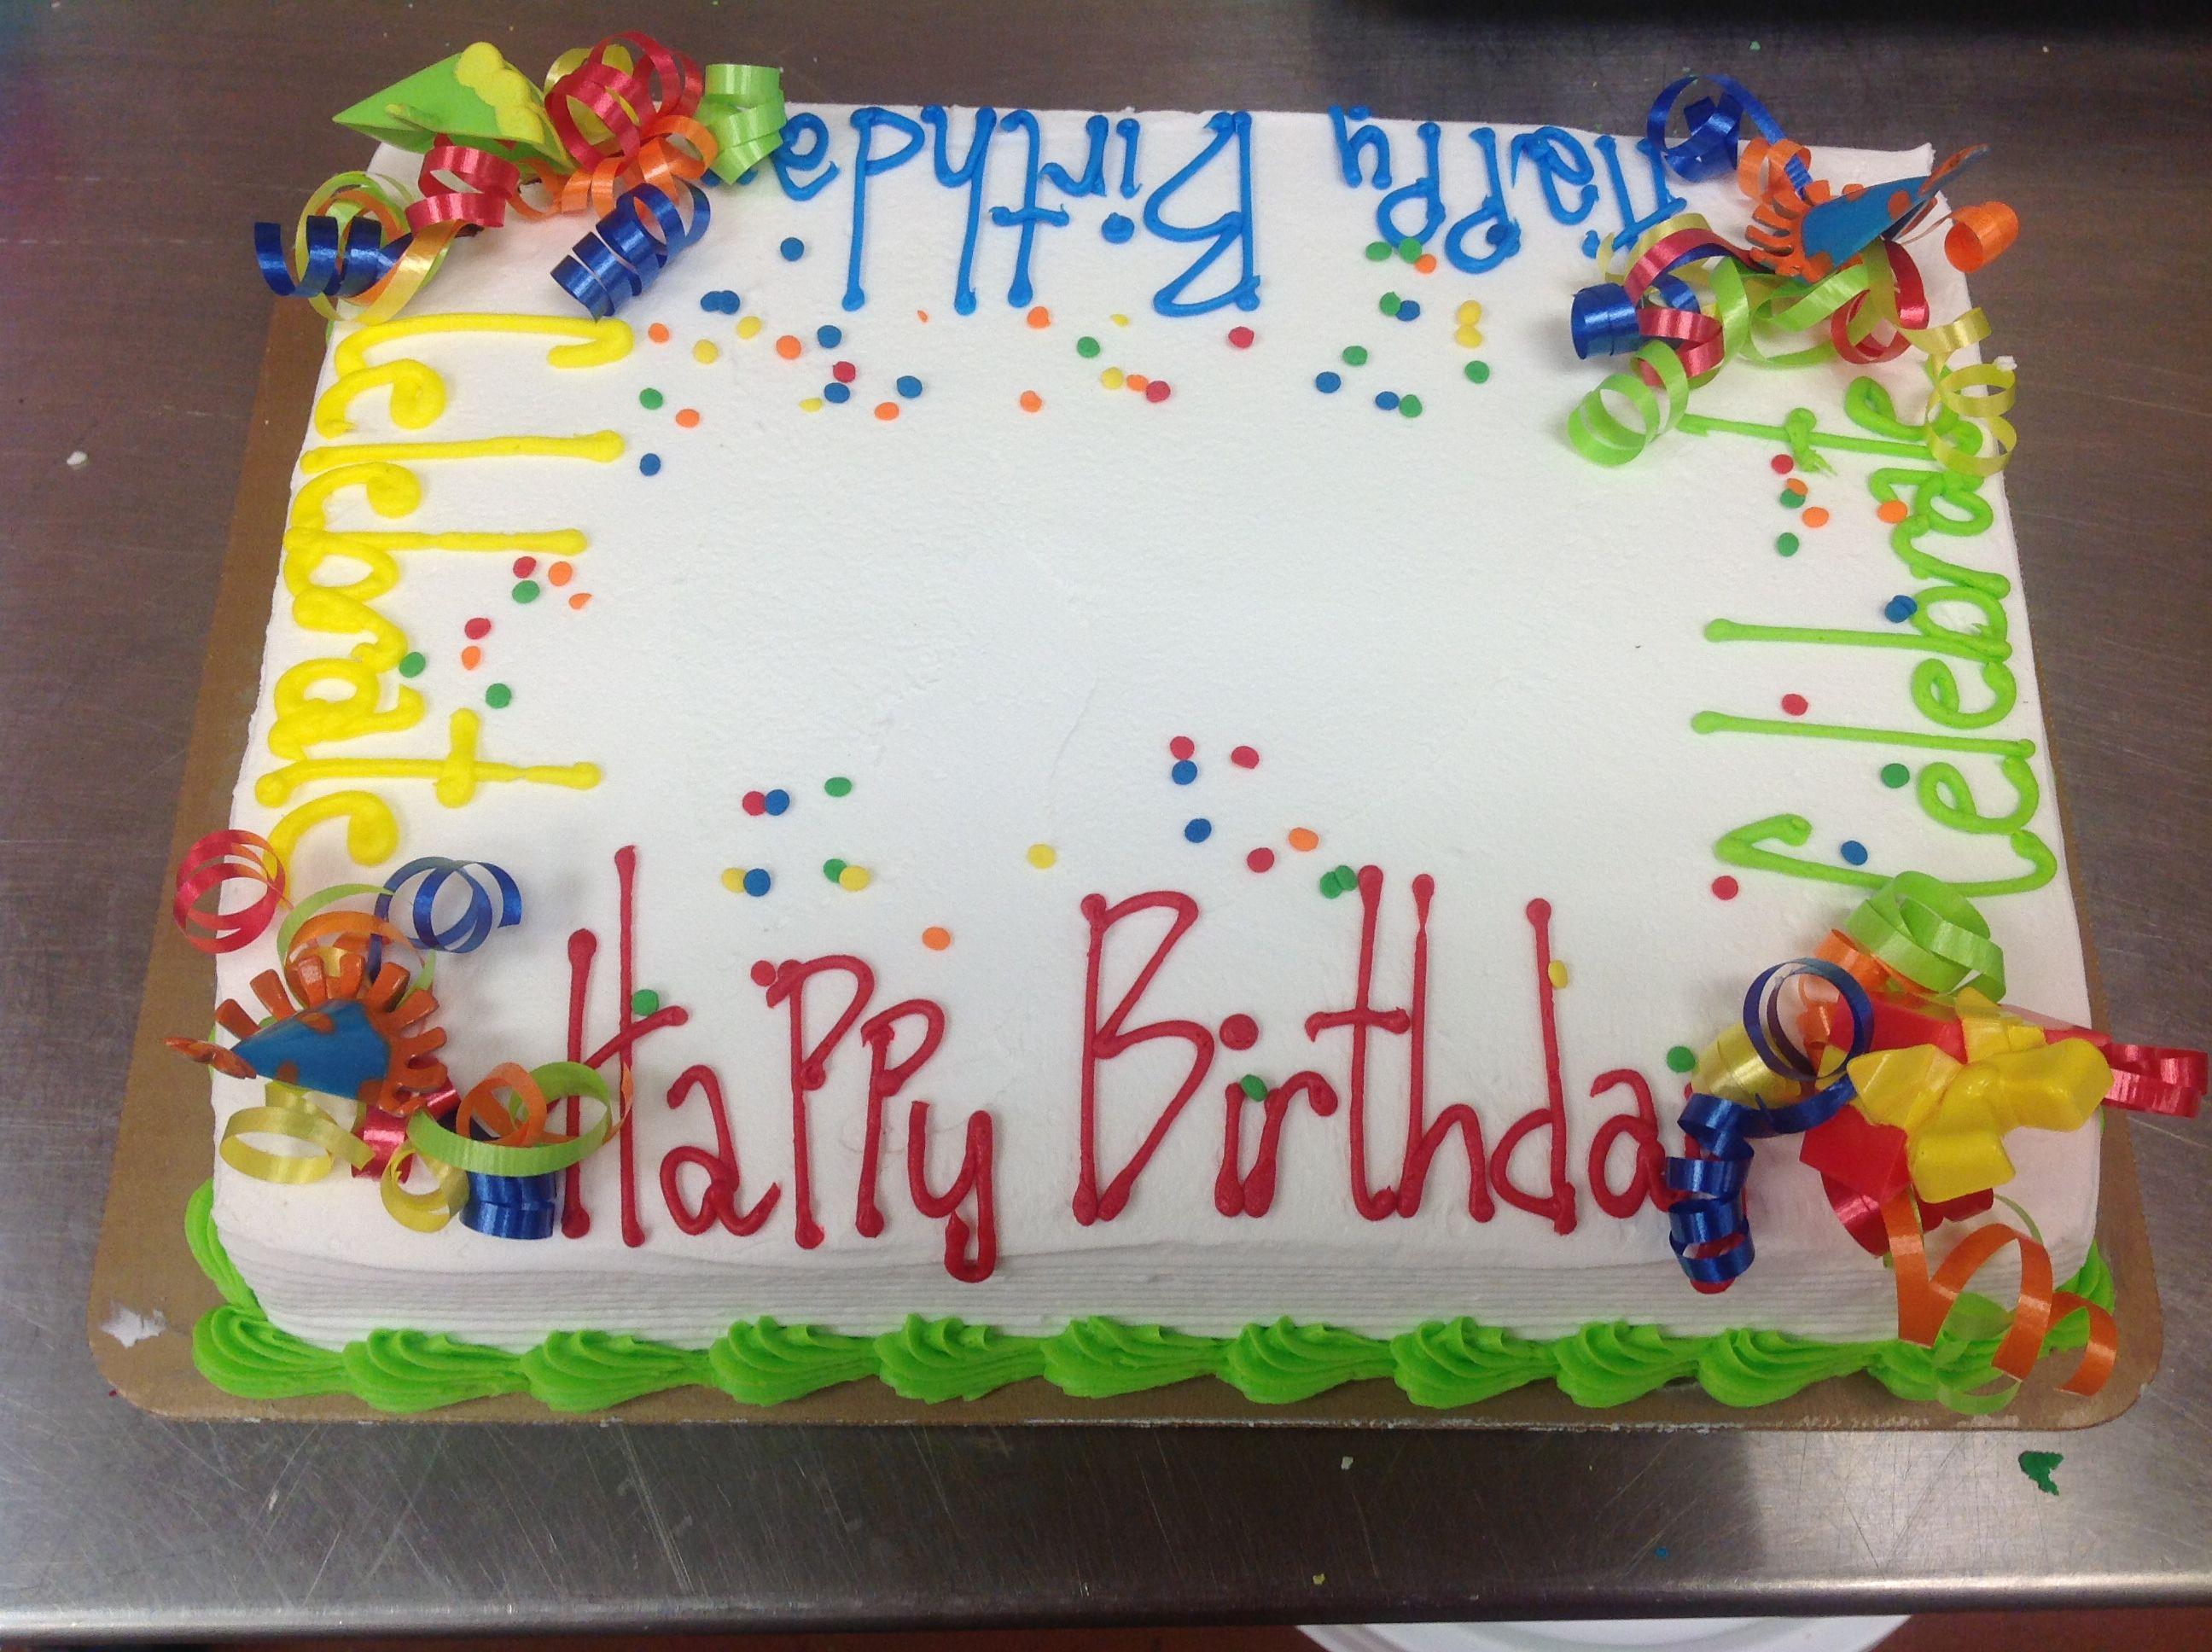 Birthday Cake Designs For Sheet Cake : One of my favorite sheet cake ideas. baking recipes ...